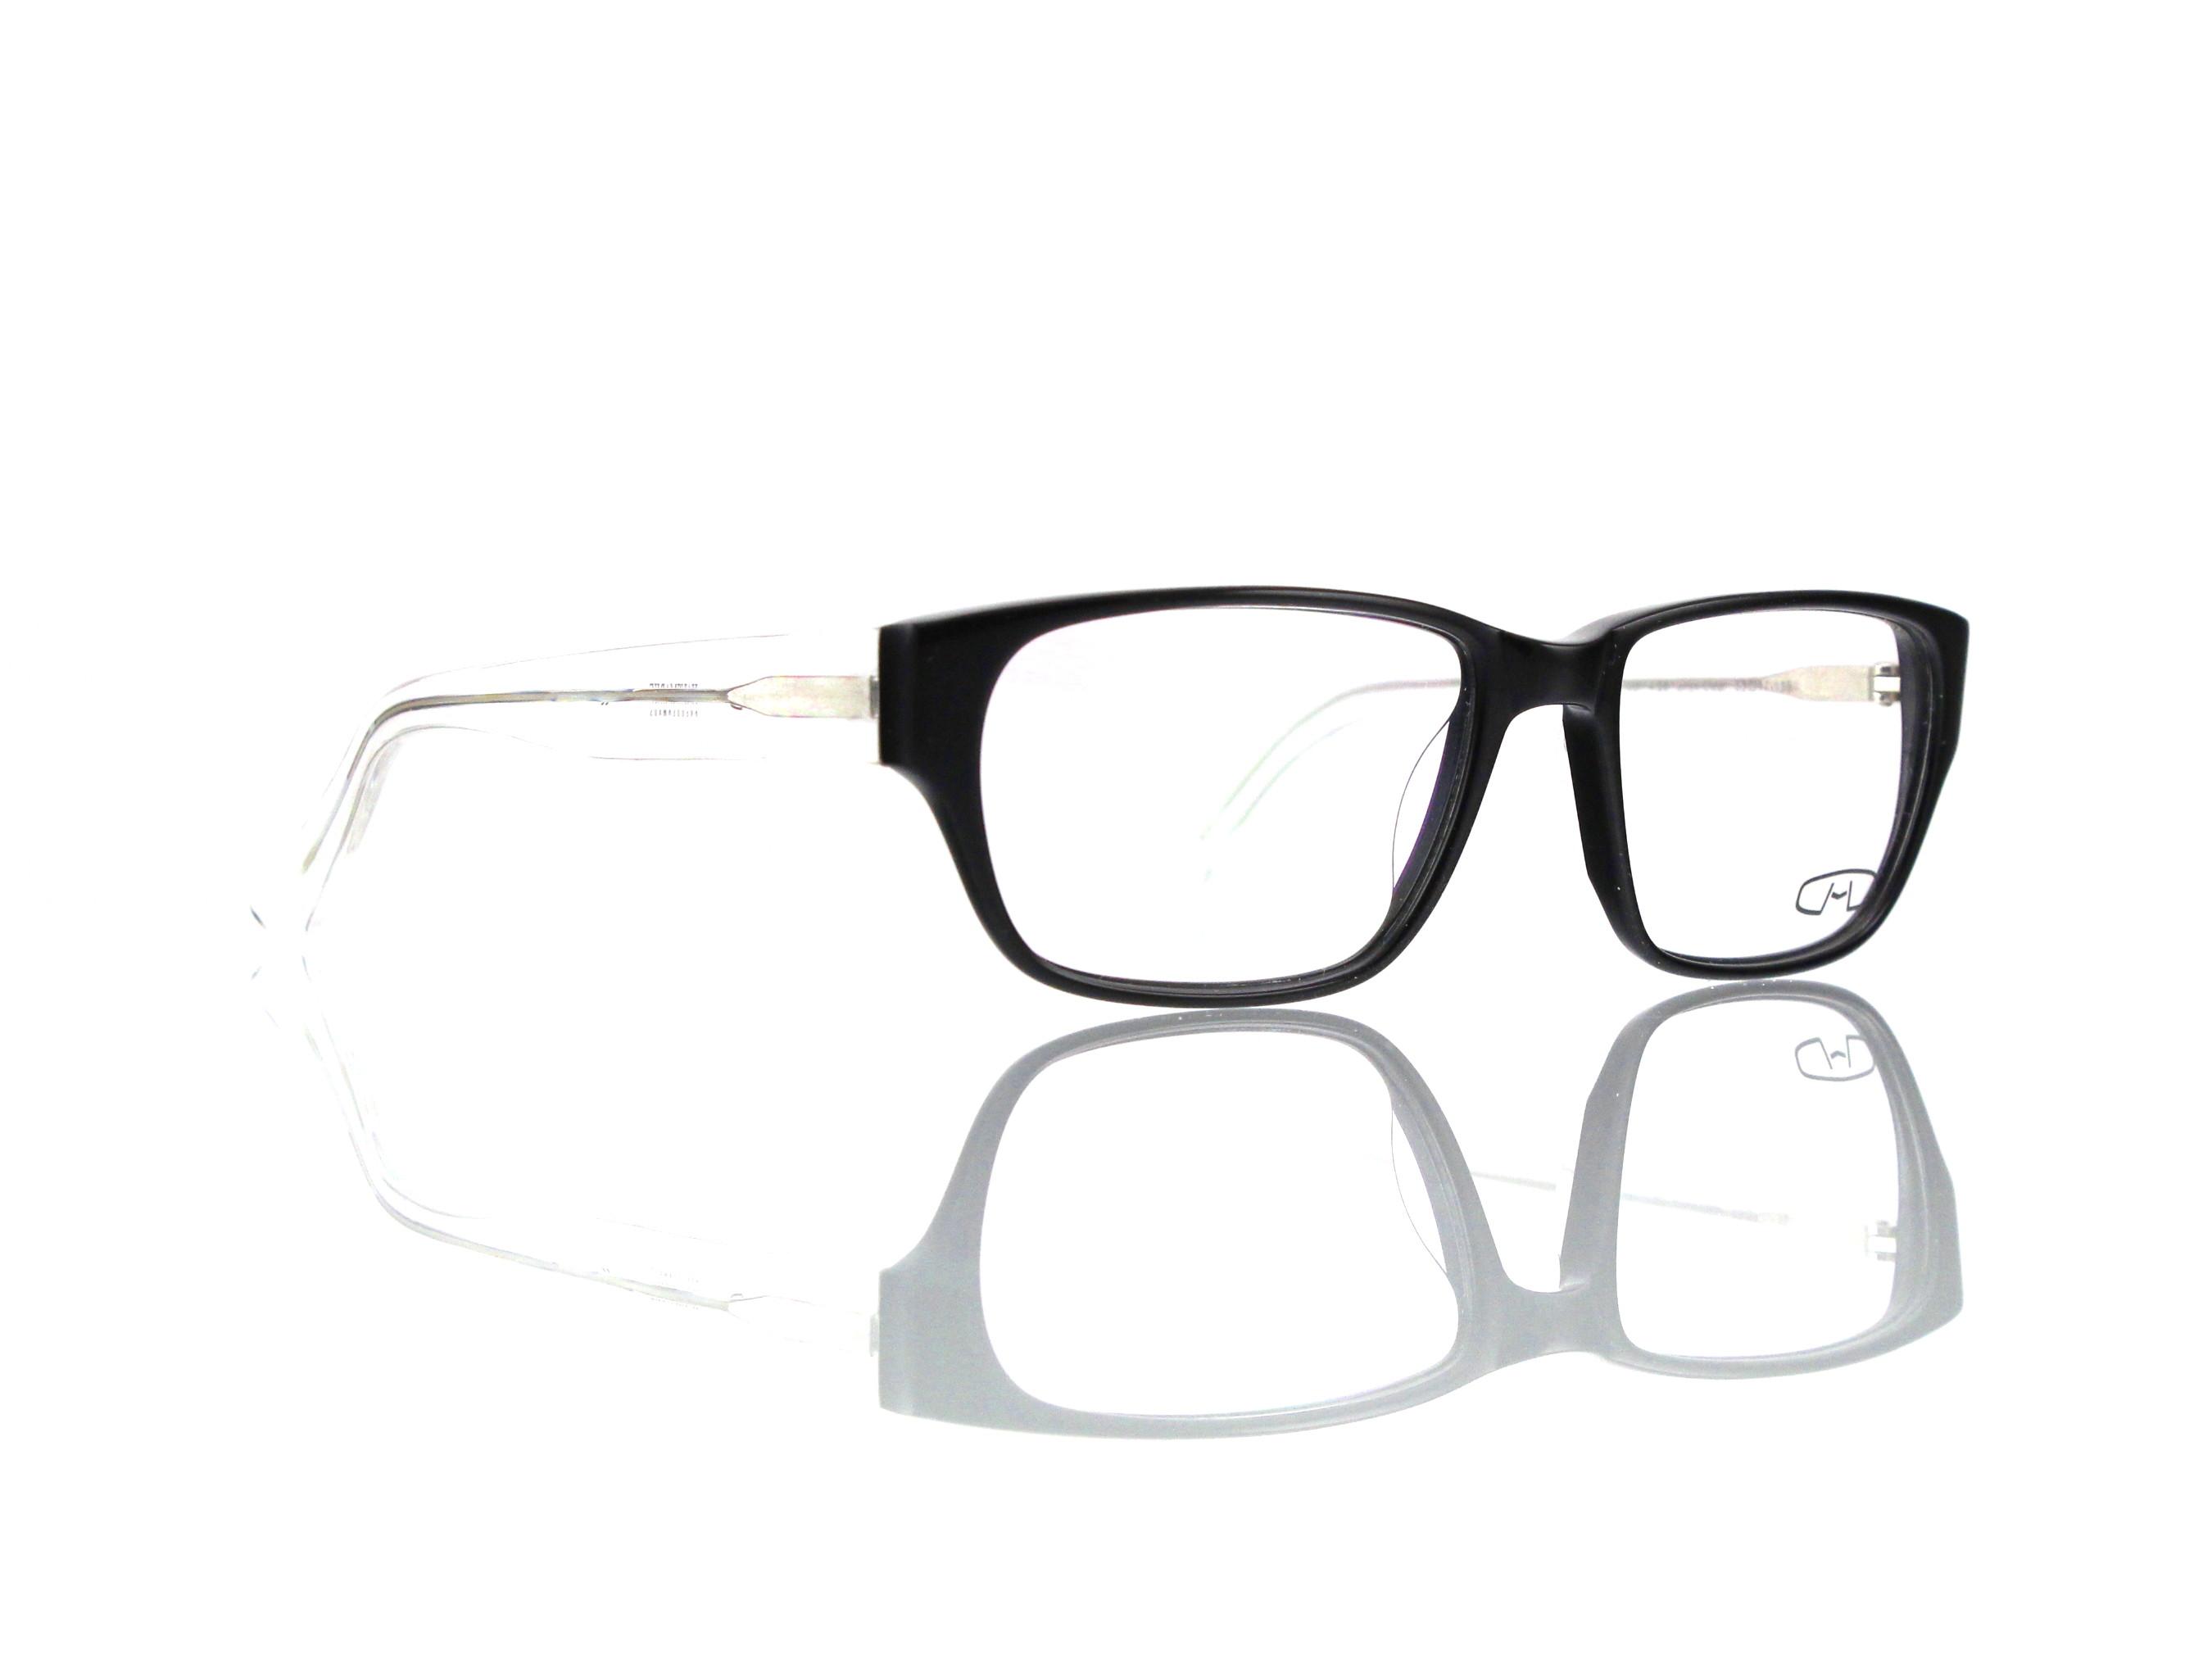 FreudenHaus Eyewear Vol. 4.26 onyx/clear Größe 53-17 Bügellänge 135 ...